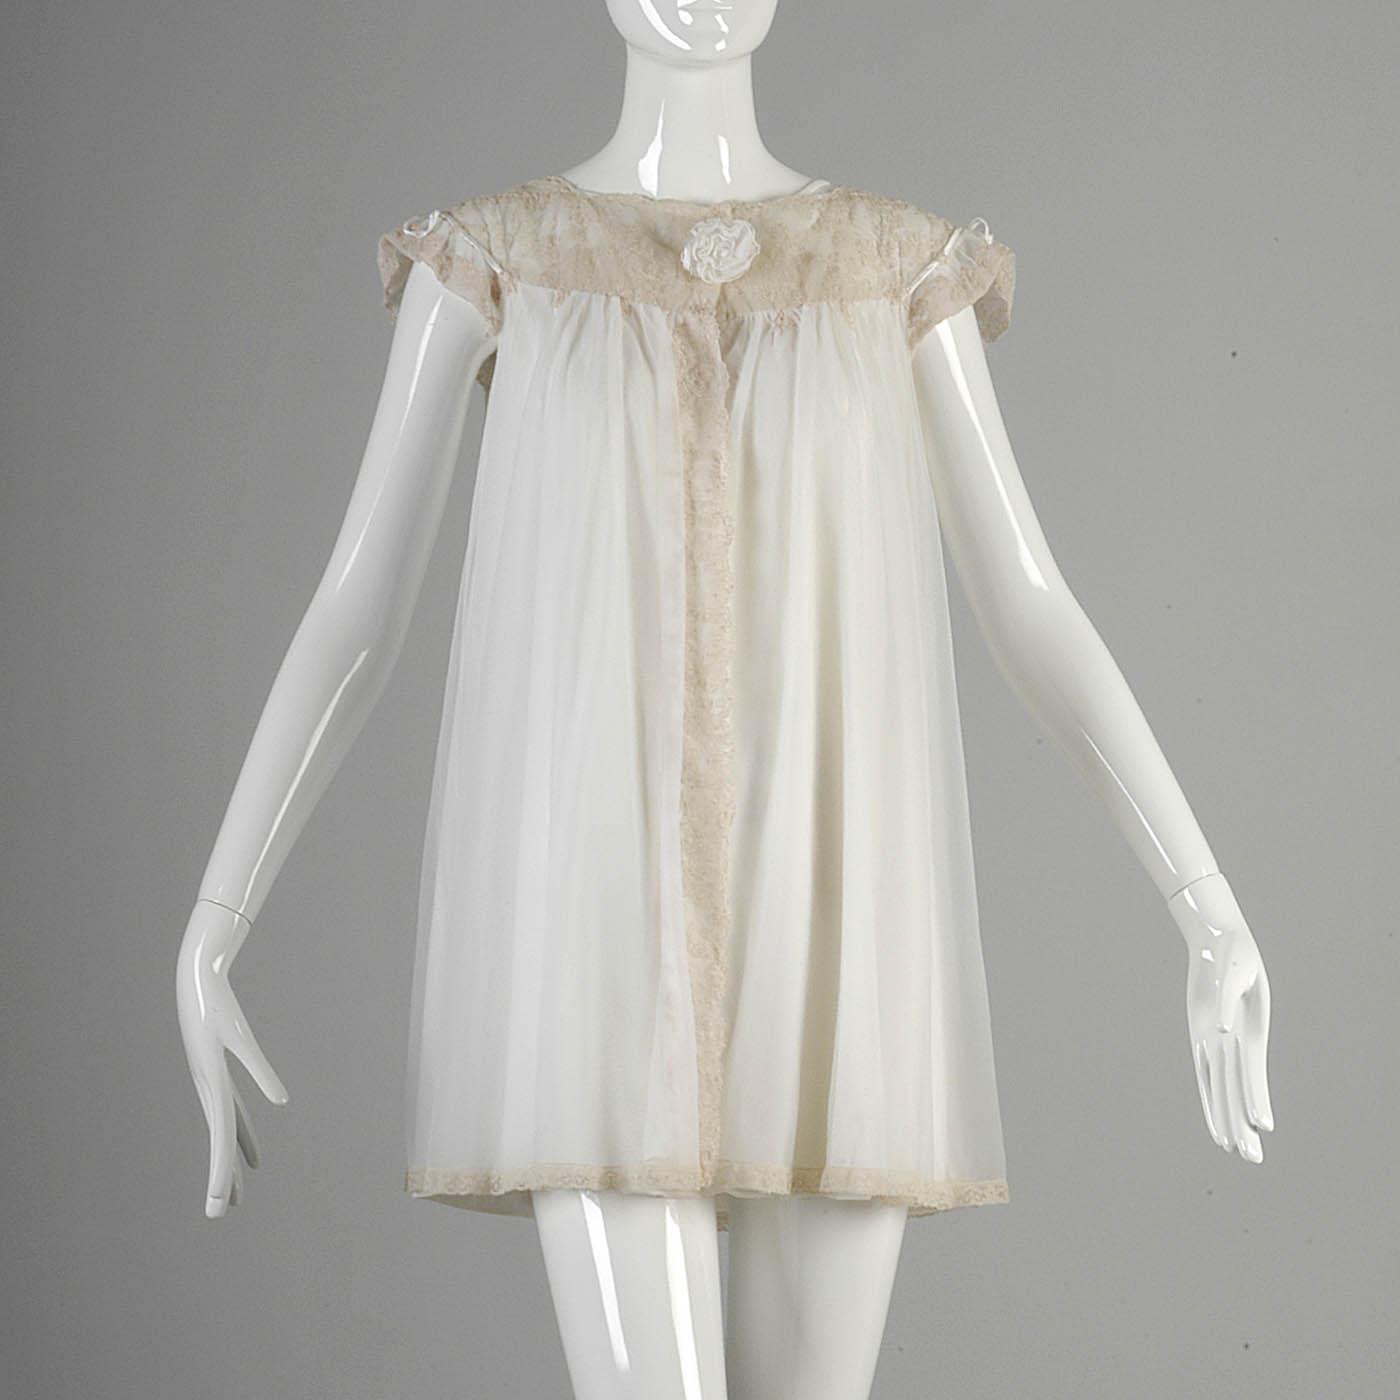 M Vintage 1960s 60s Alice Maloof Lingerie Set Chiffon